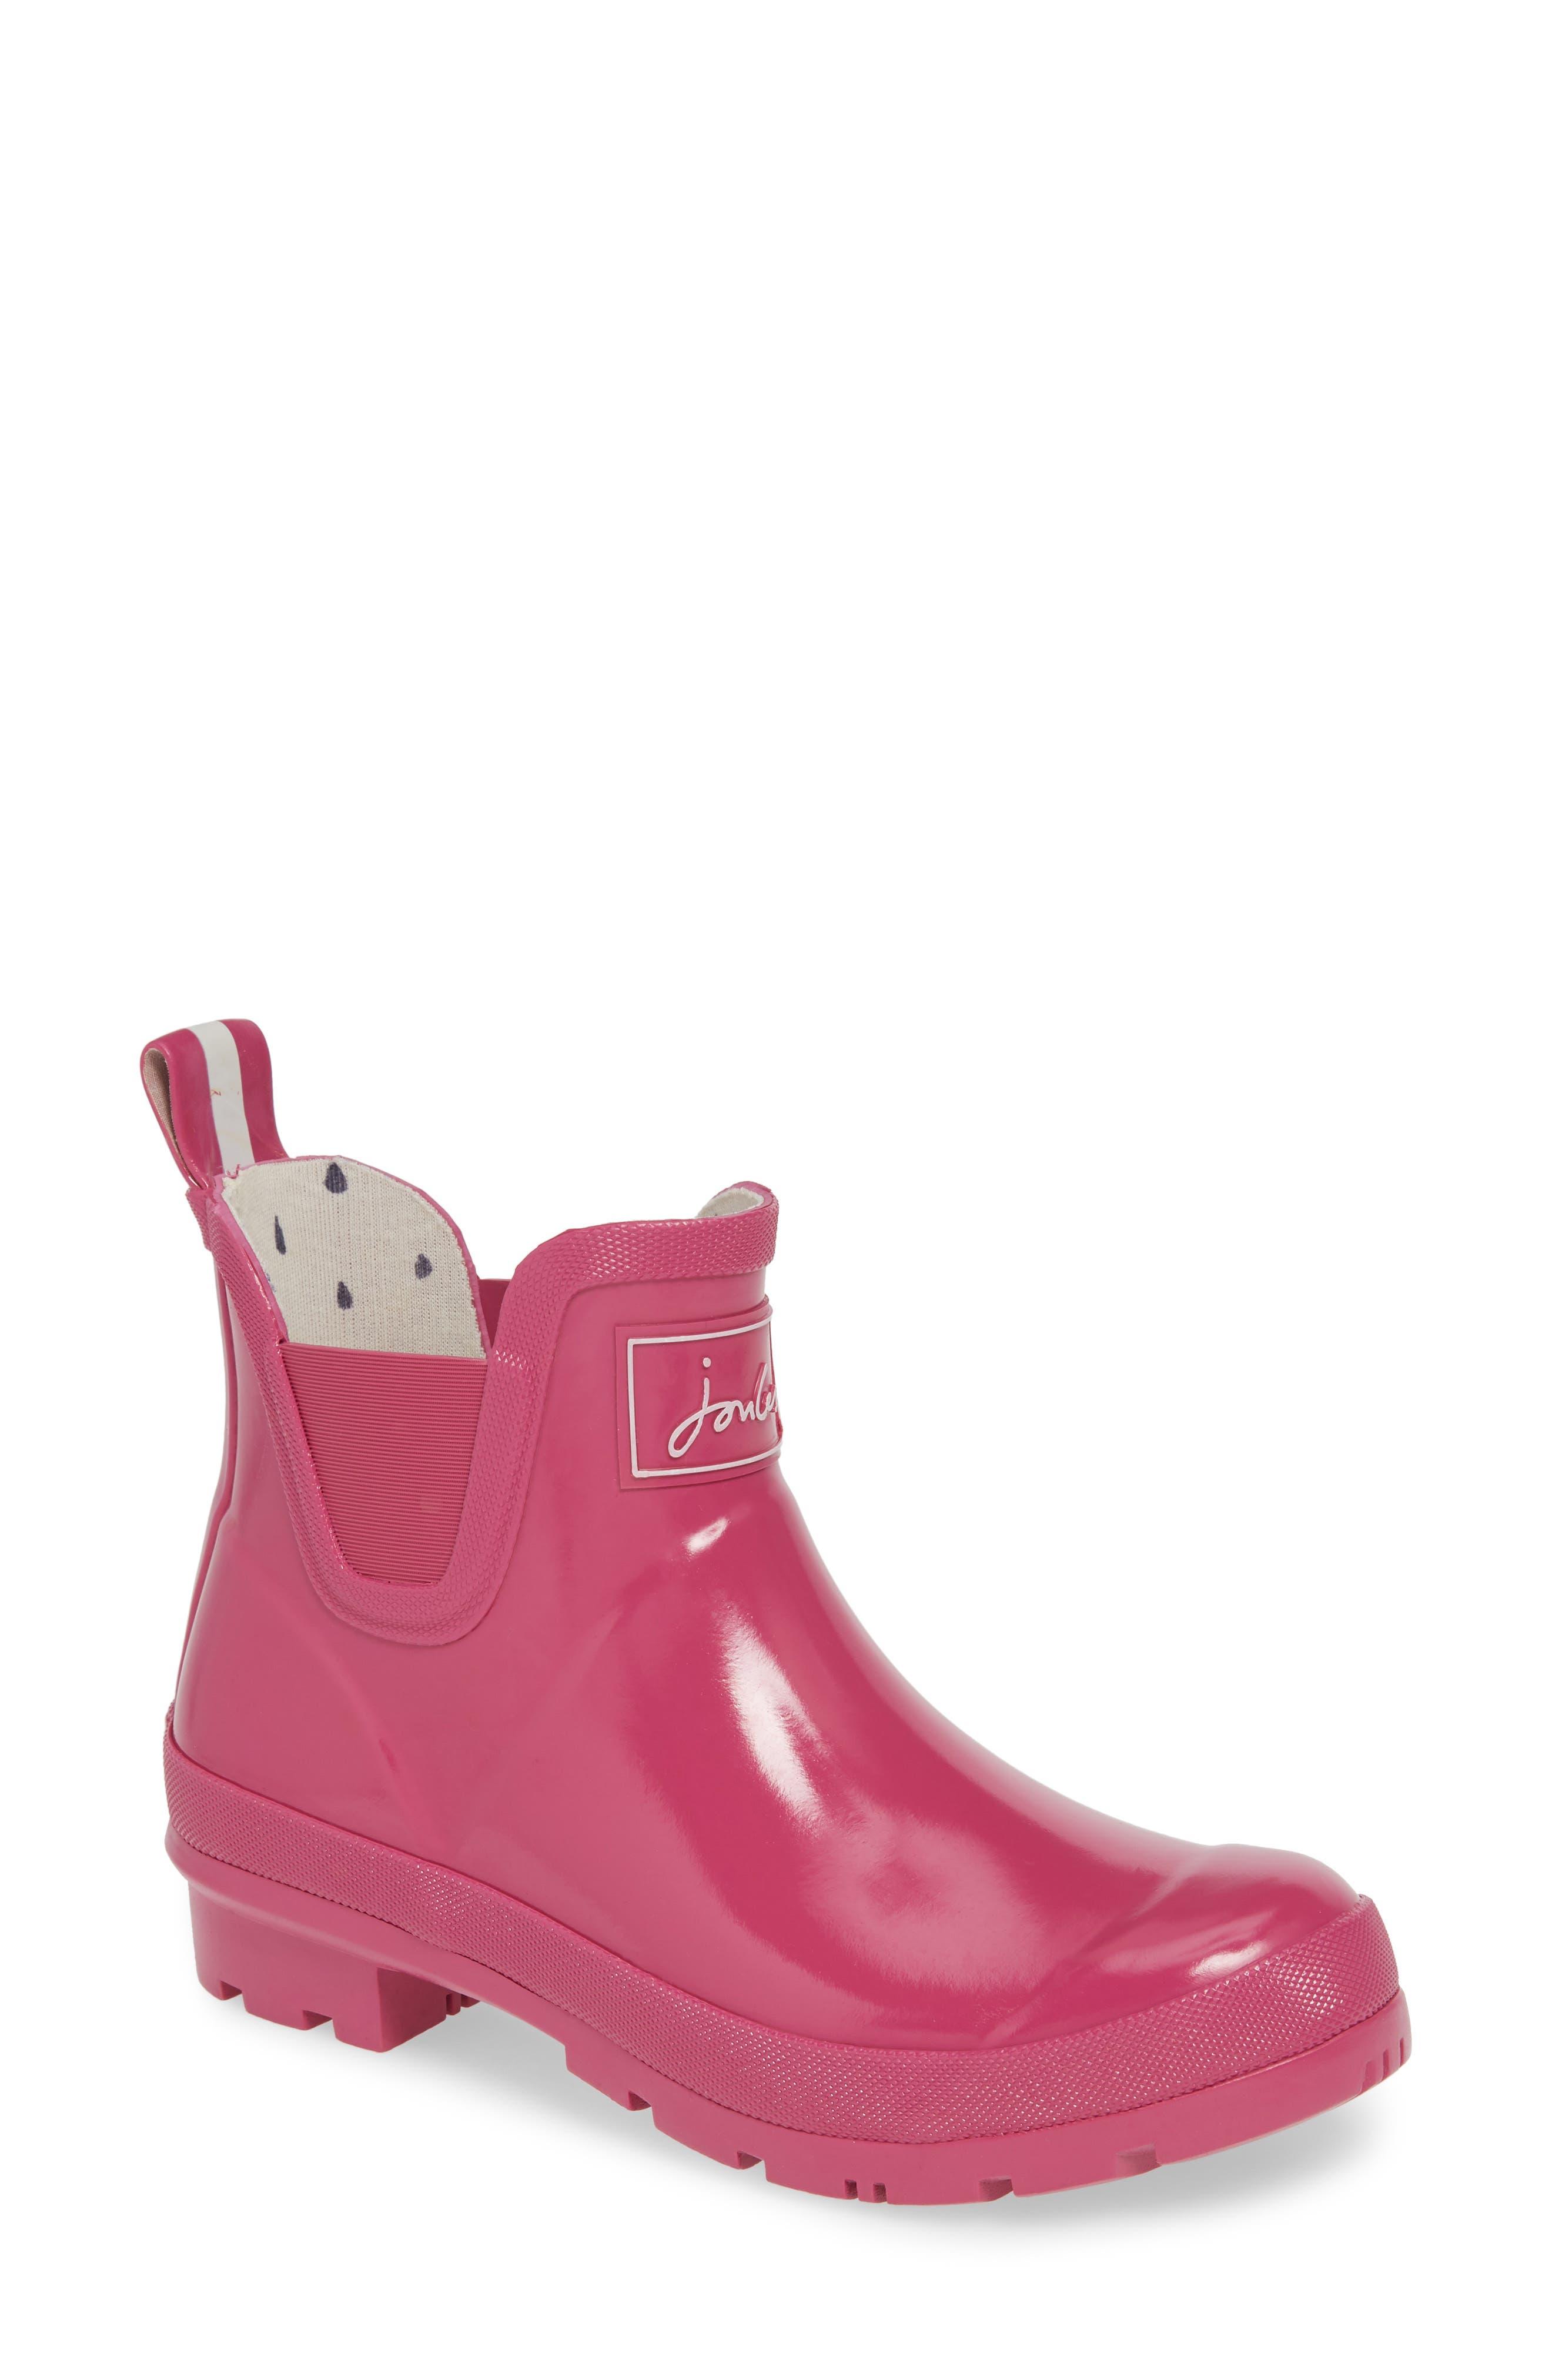 JOULES, Wellibob Short Rain Boot, Main thumbnail 1, color, PINK/ PINK